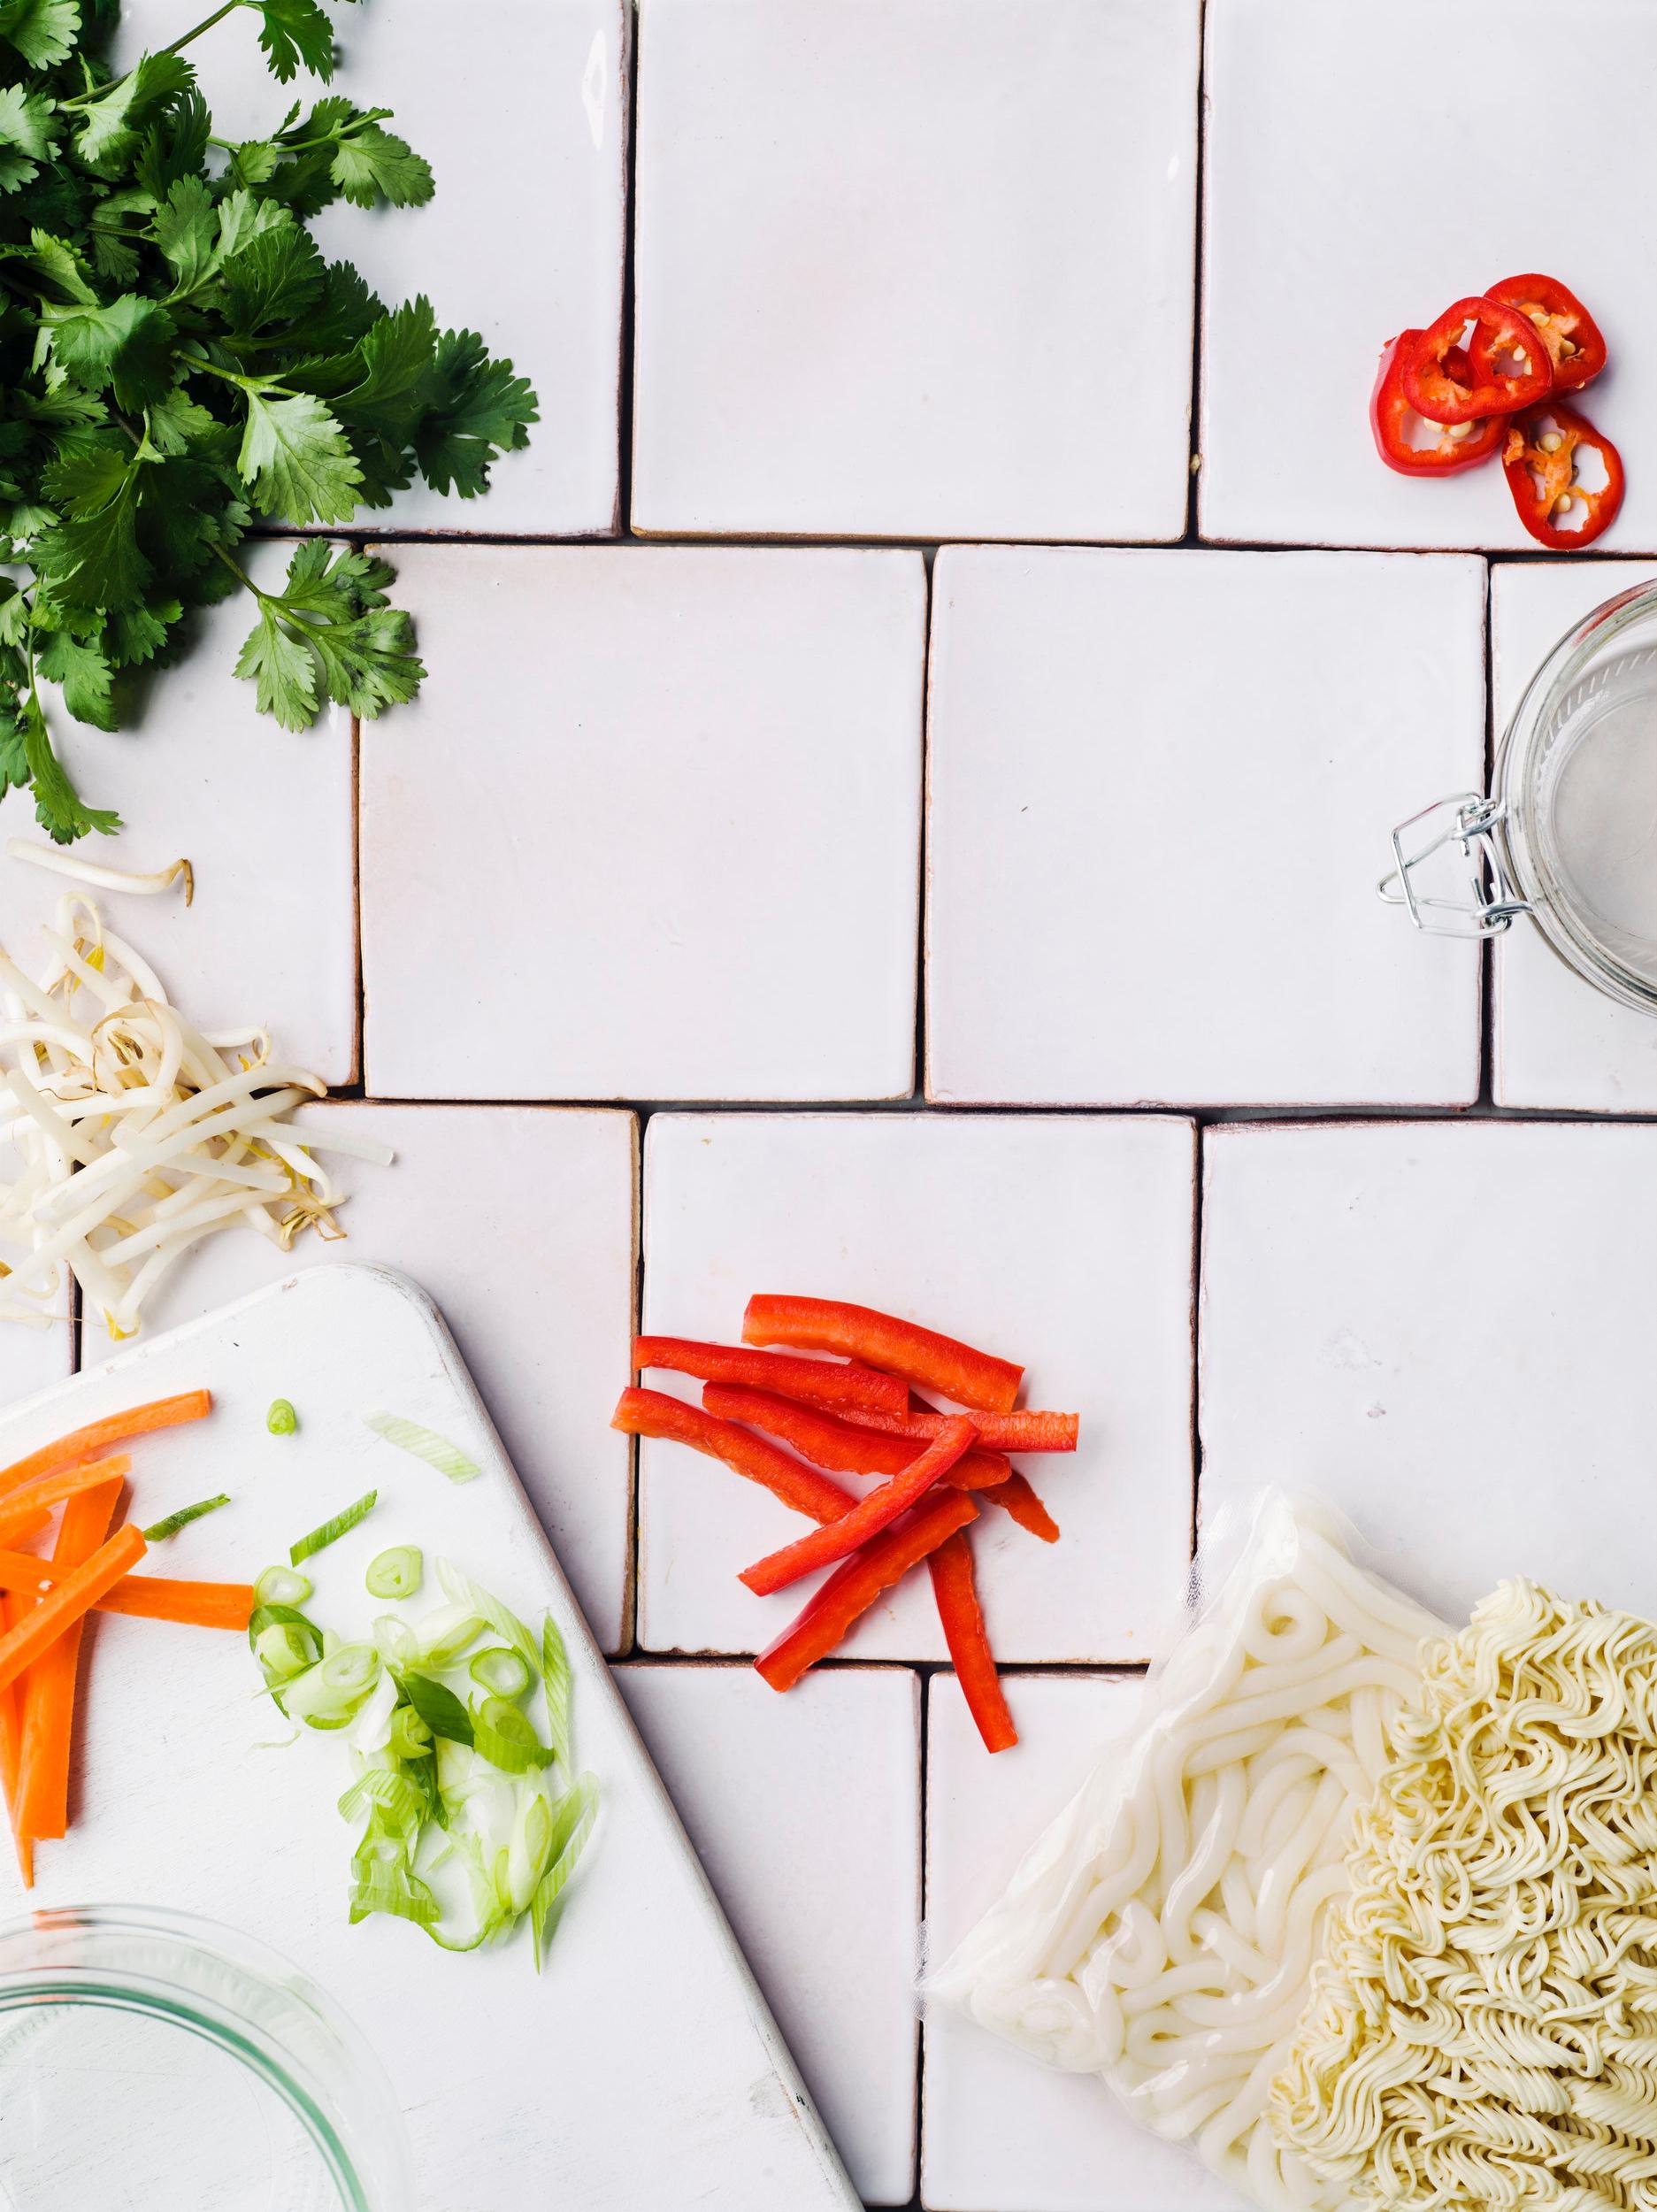 HH+Pavillion+Jar+Food+Contents+page+001.jpg